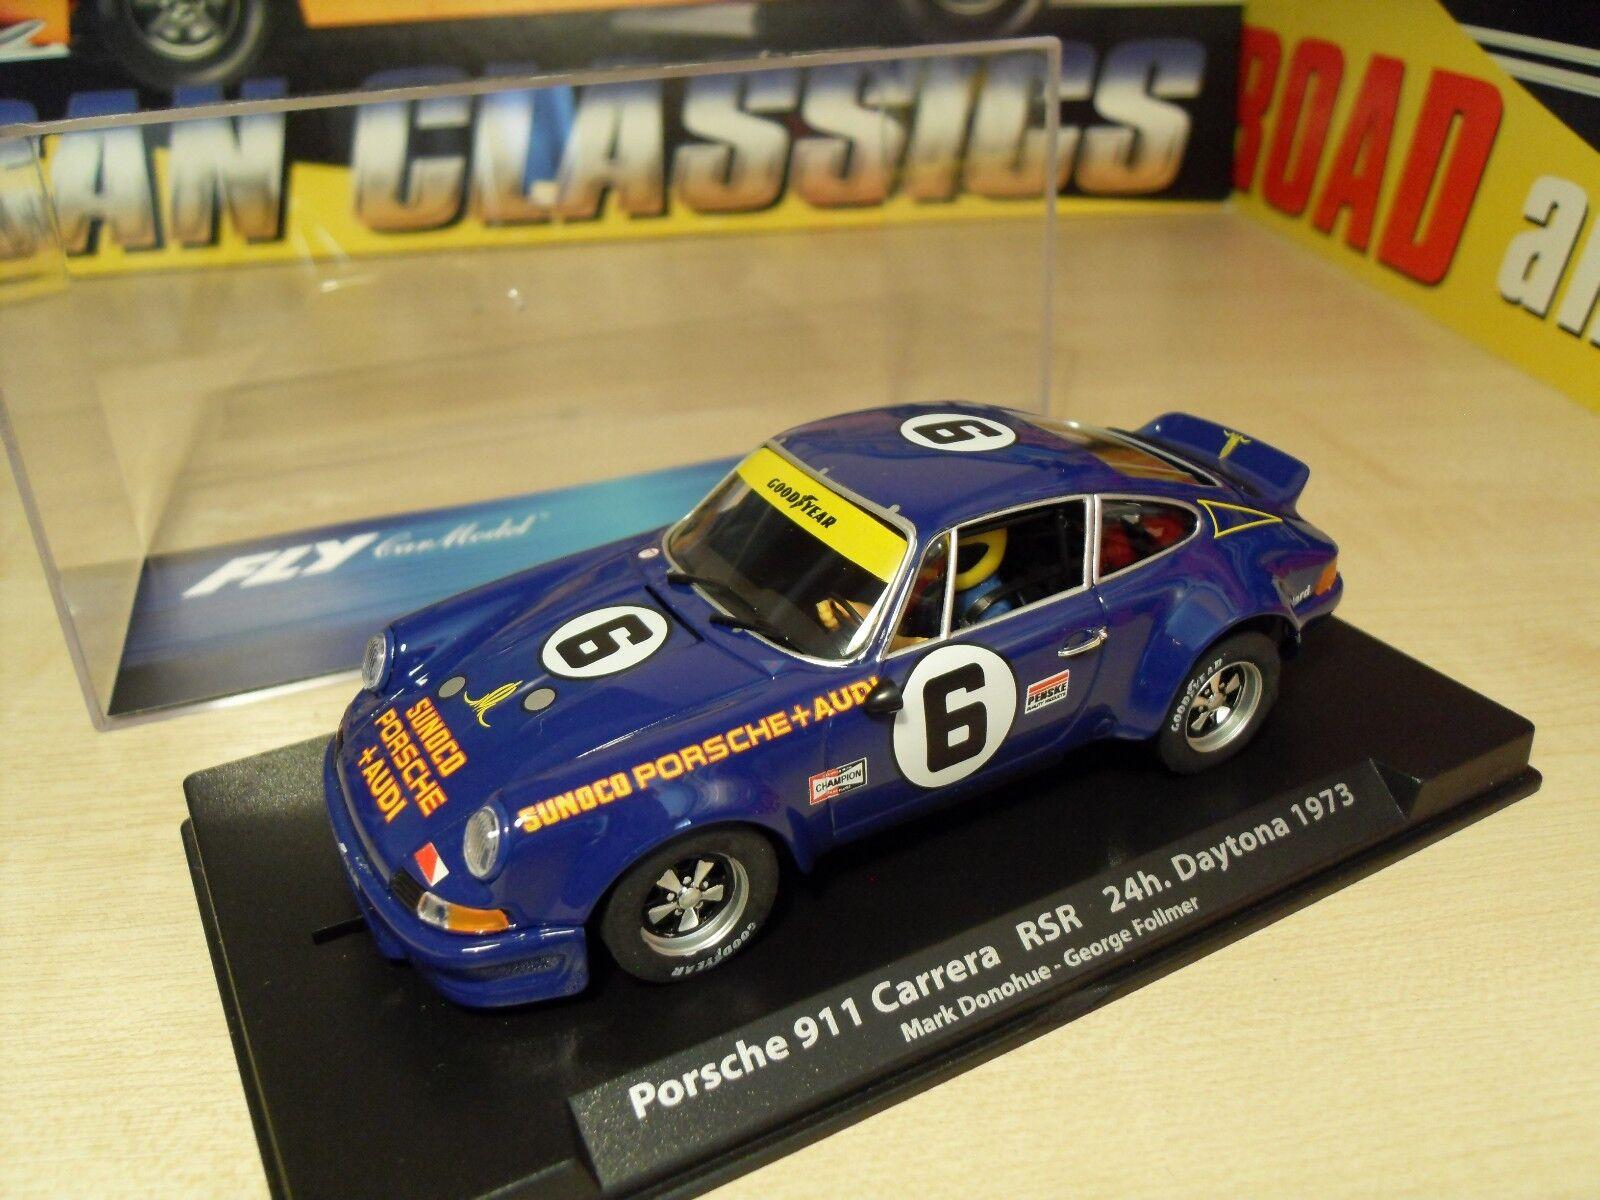 88351 - Porsche 911 Carrera RSR - '24h Daytona 1973' - Brand New in Box.